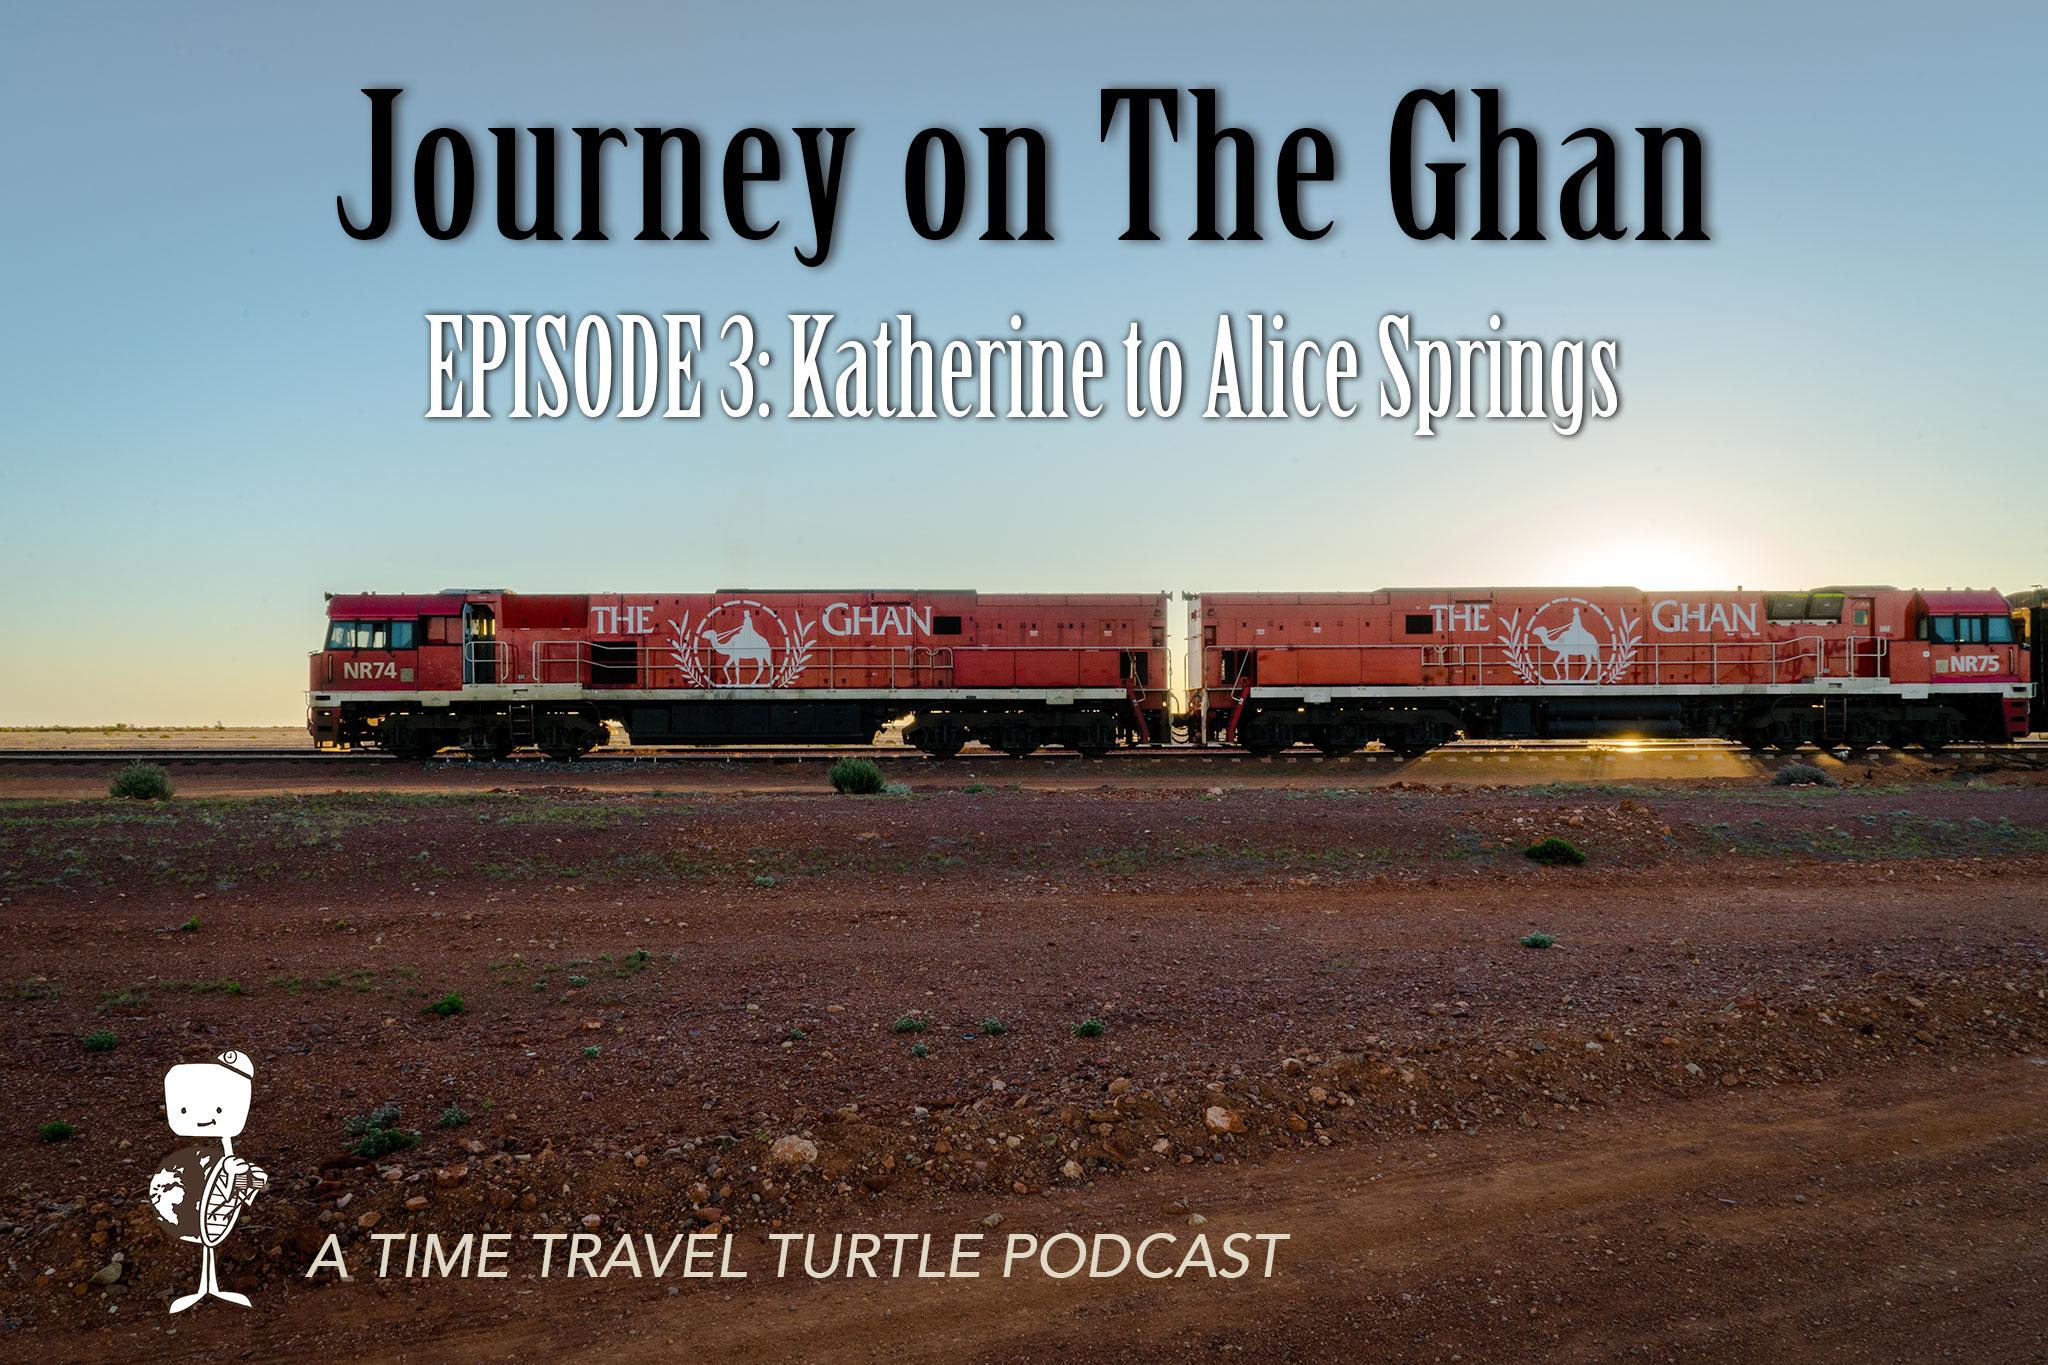 Episode 3: Katherine to Alice Springs